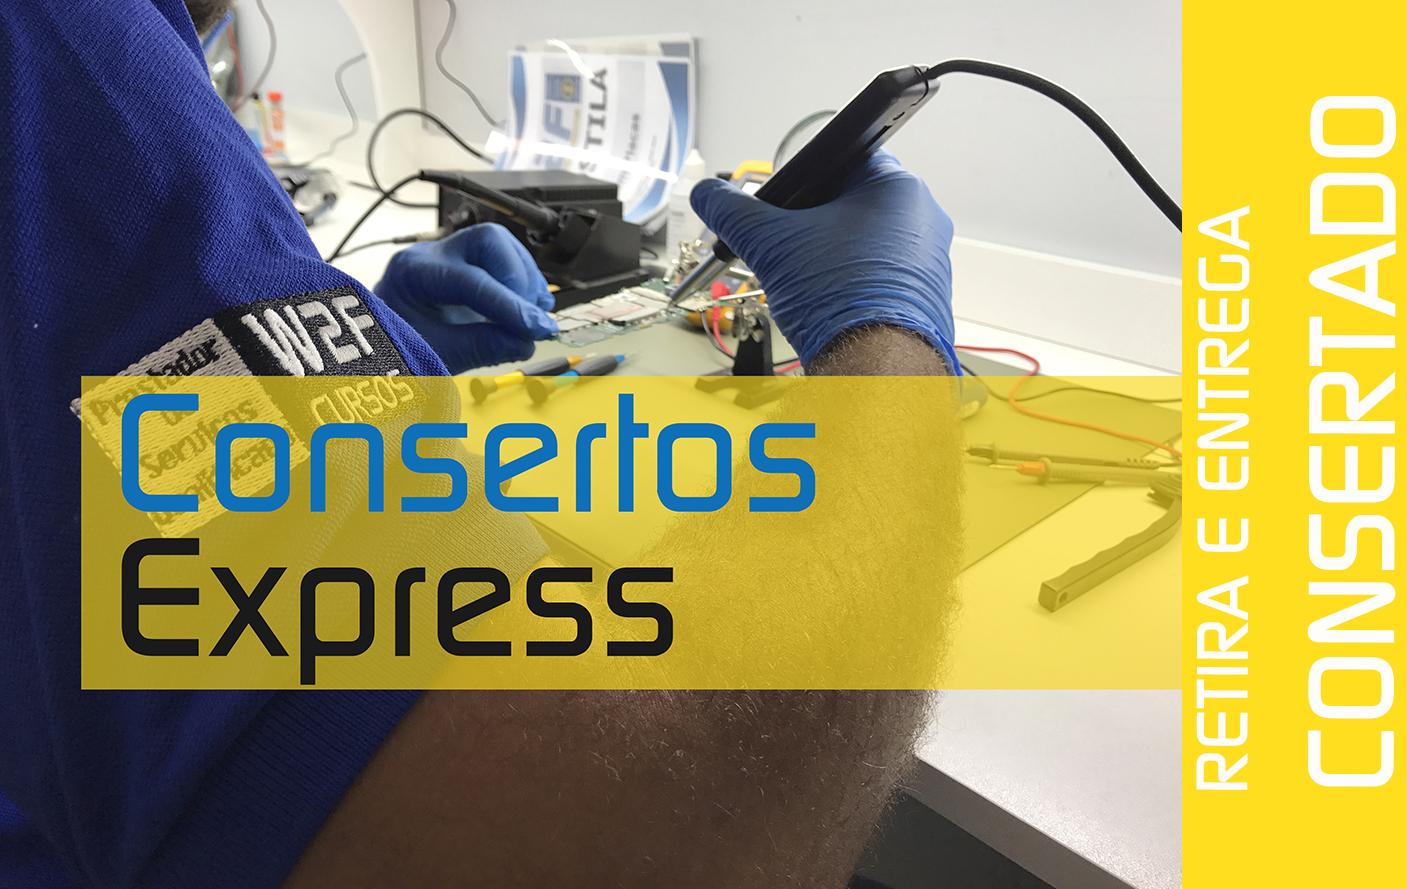 Consertos Express - Consertar Celular em Domicílio -